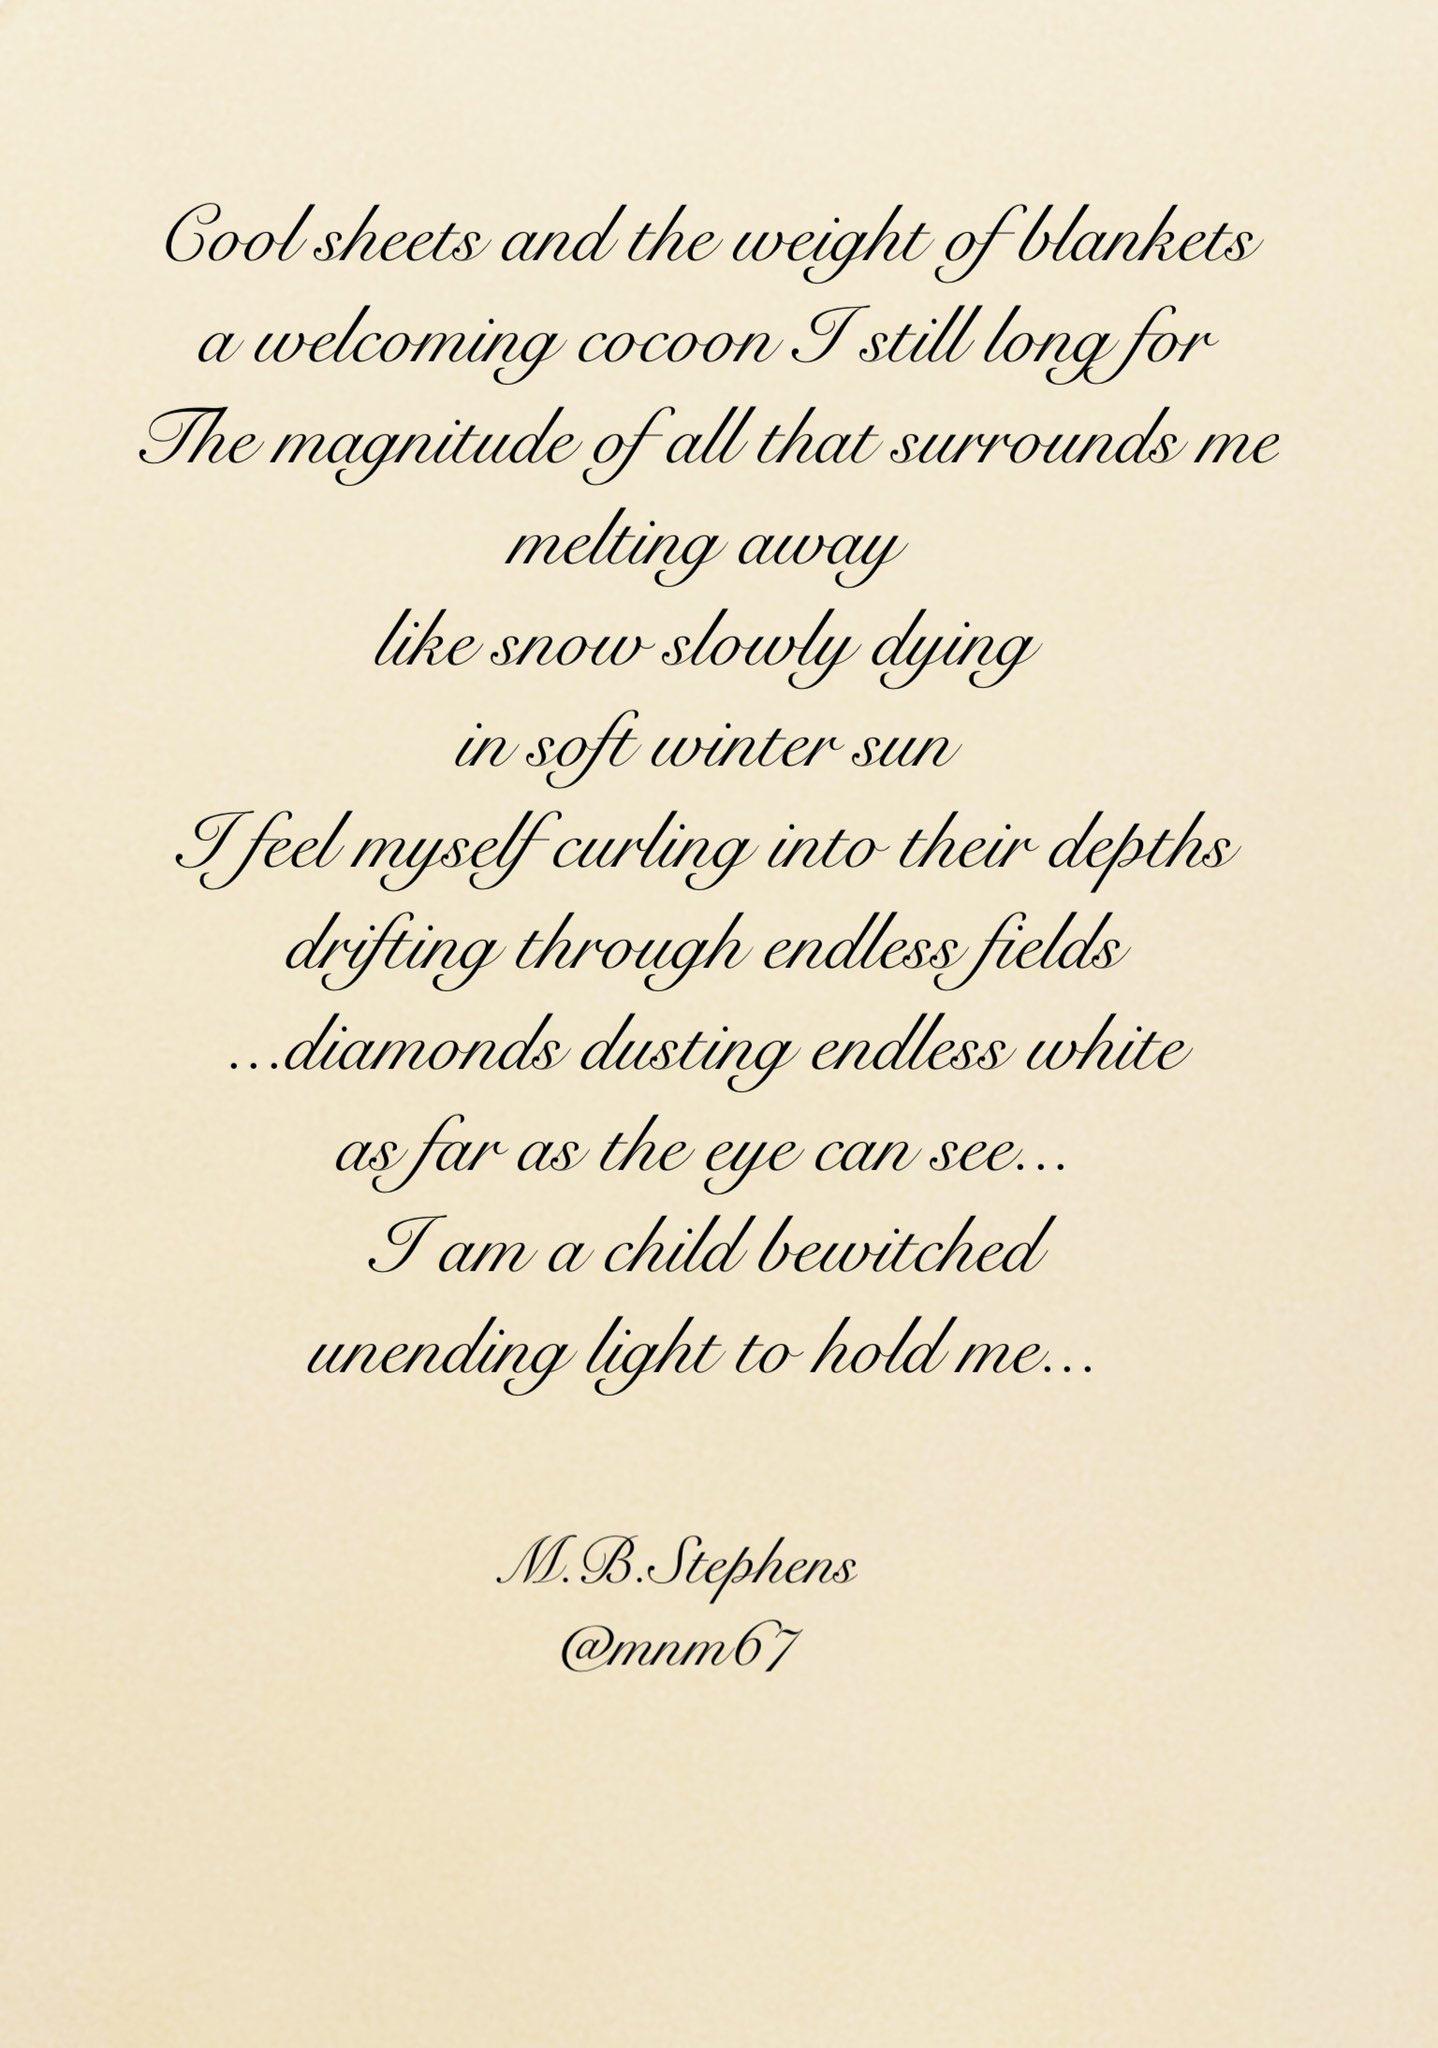 #poetry https://t.co/ymjNq89qi4